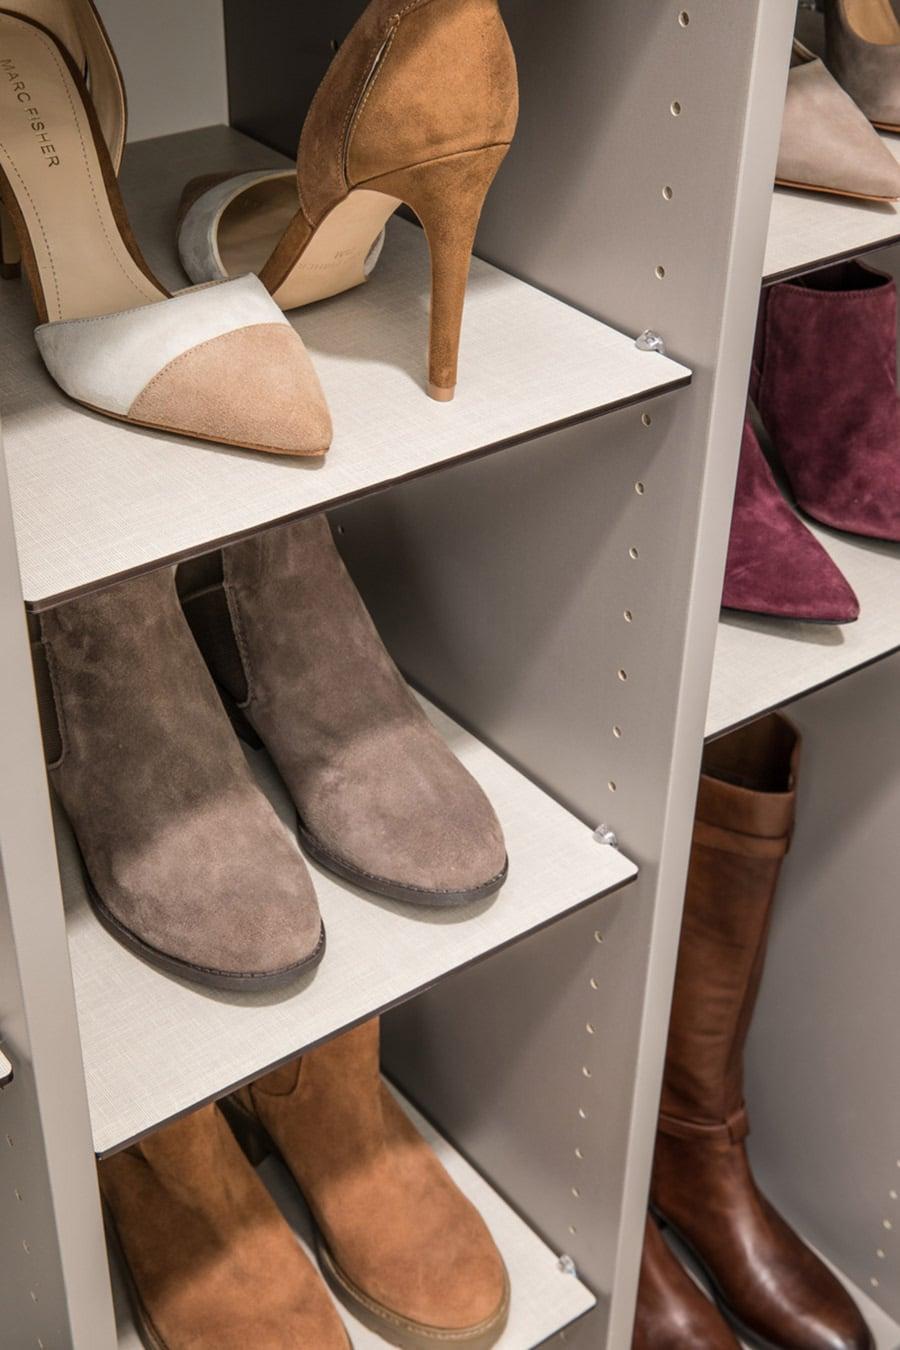 feature 1 adjustable shoe shelves pataskala ohio closet | Innovate Home Org | Dublin, OH | #ColumbusClosets #ShoeStorage #Adjustableshelving #Shoestorage